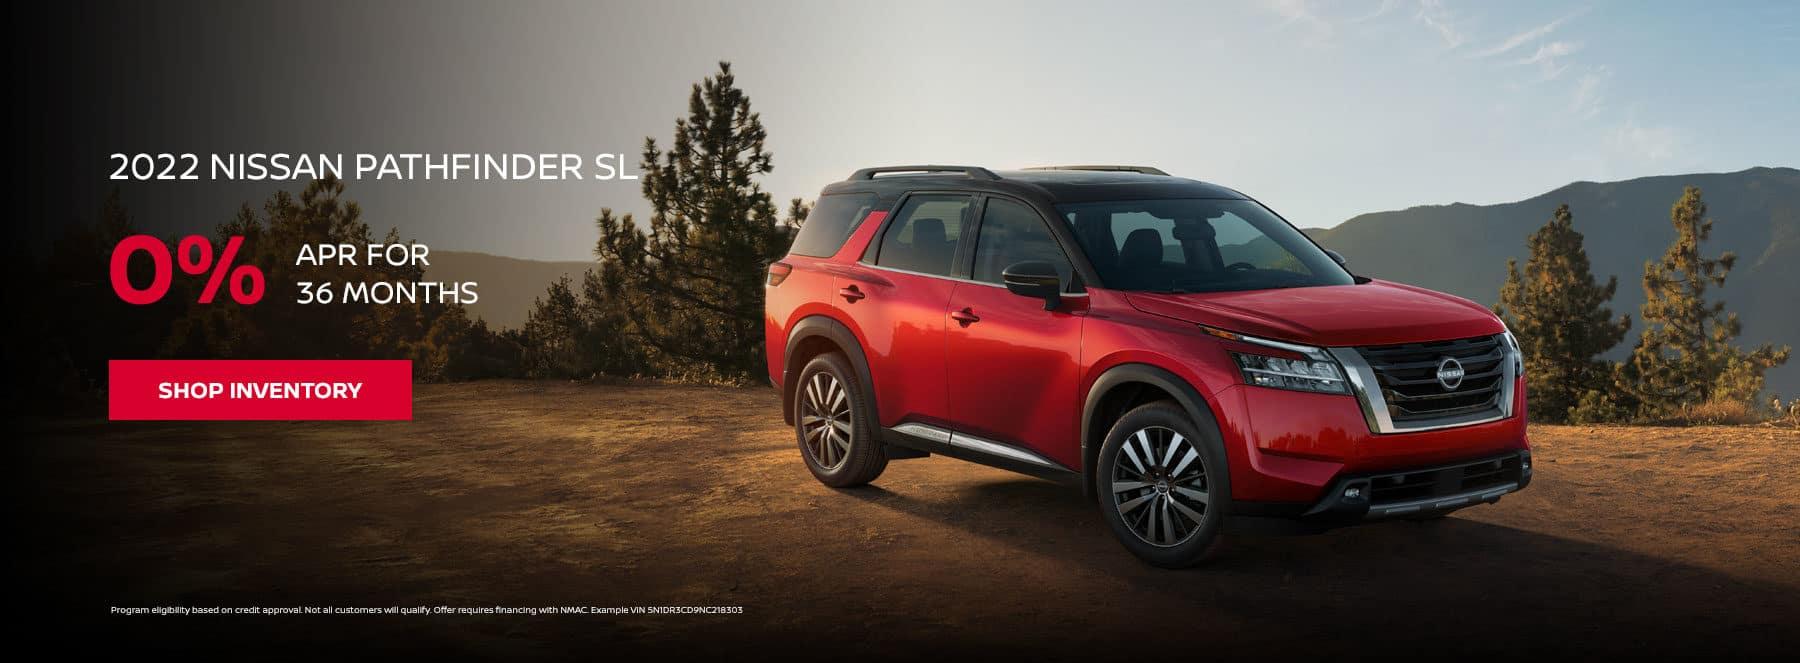 2022 Nissan Pathfinder SL, 0% APR for 36 months